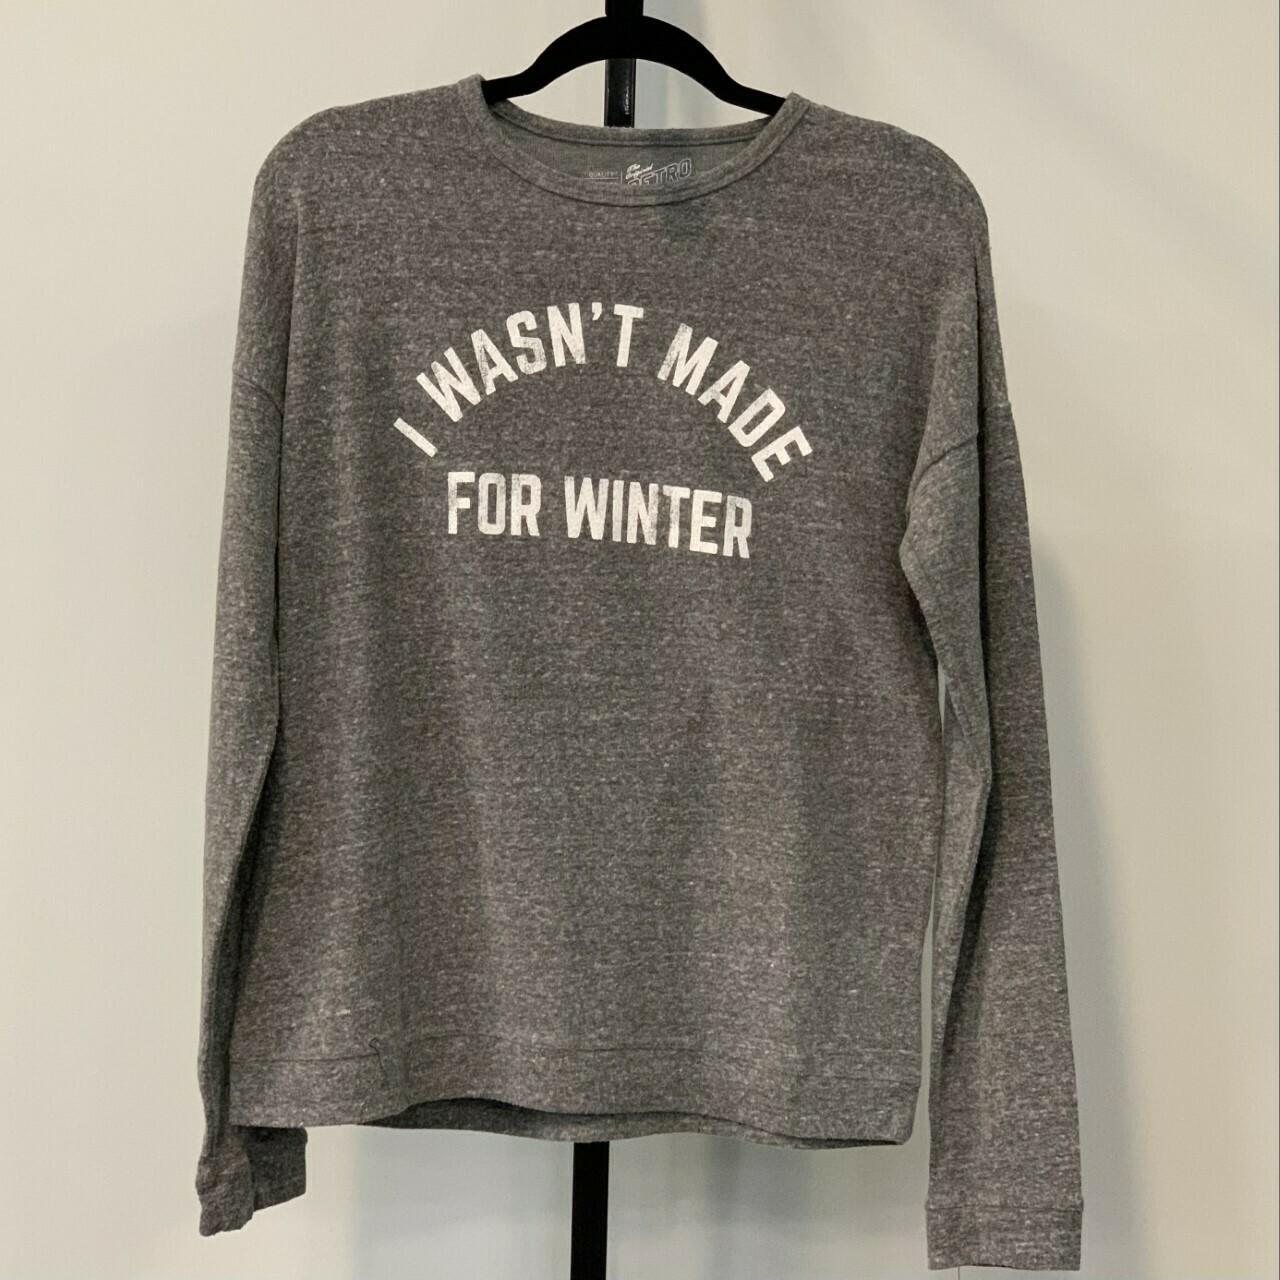 I WASN'T MADE FOR WINTER Super Soft Hachi Sweatshirt